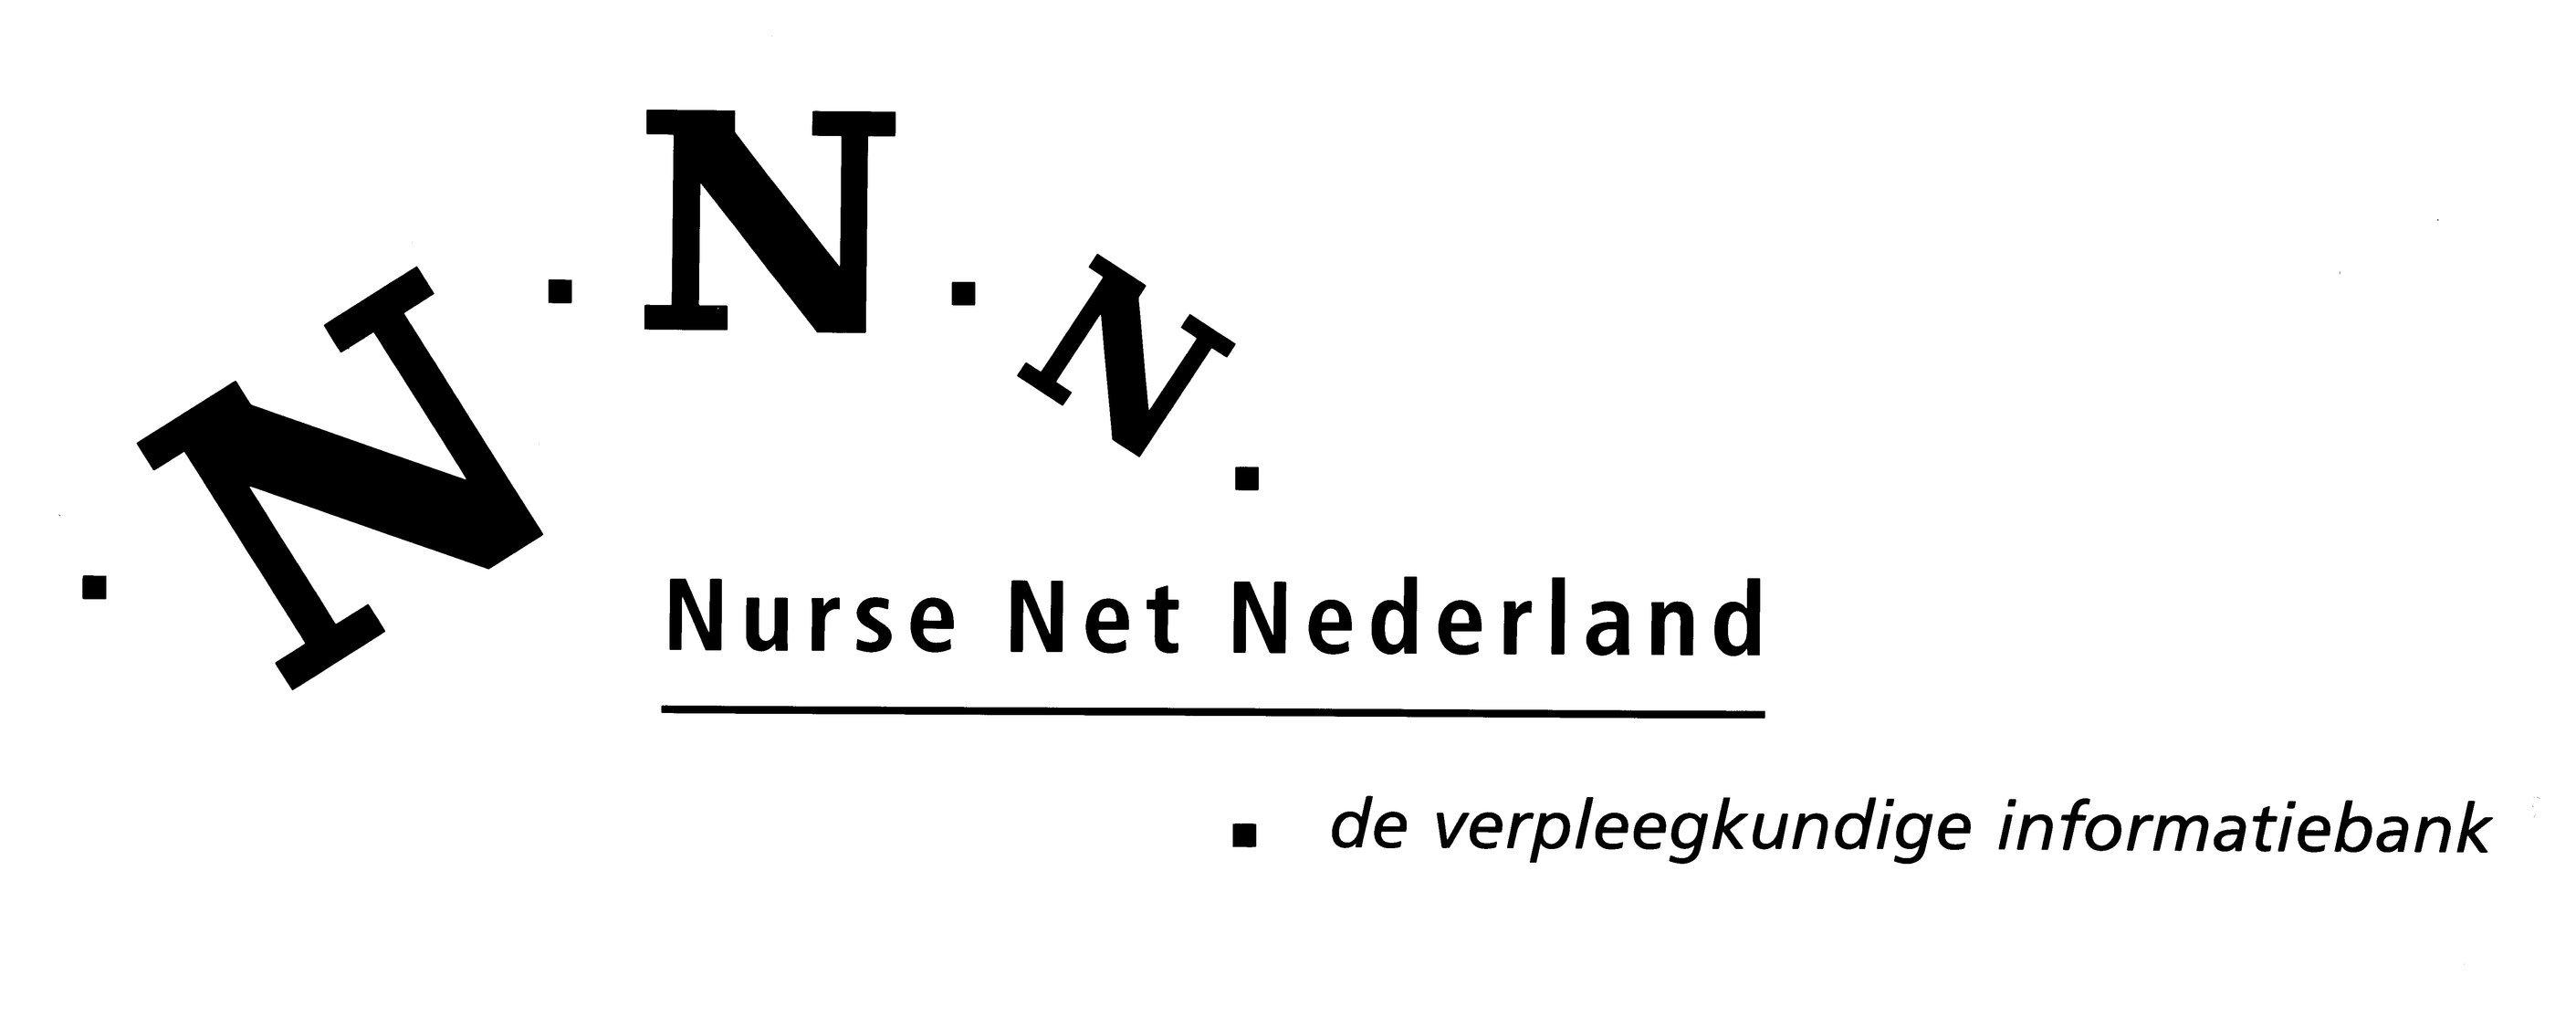 Nurse Net Nederland